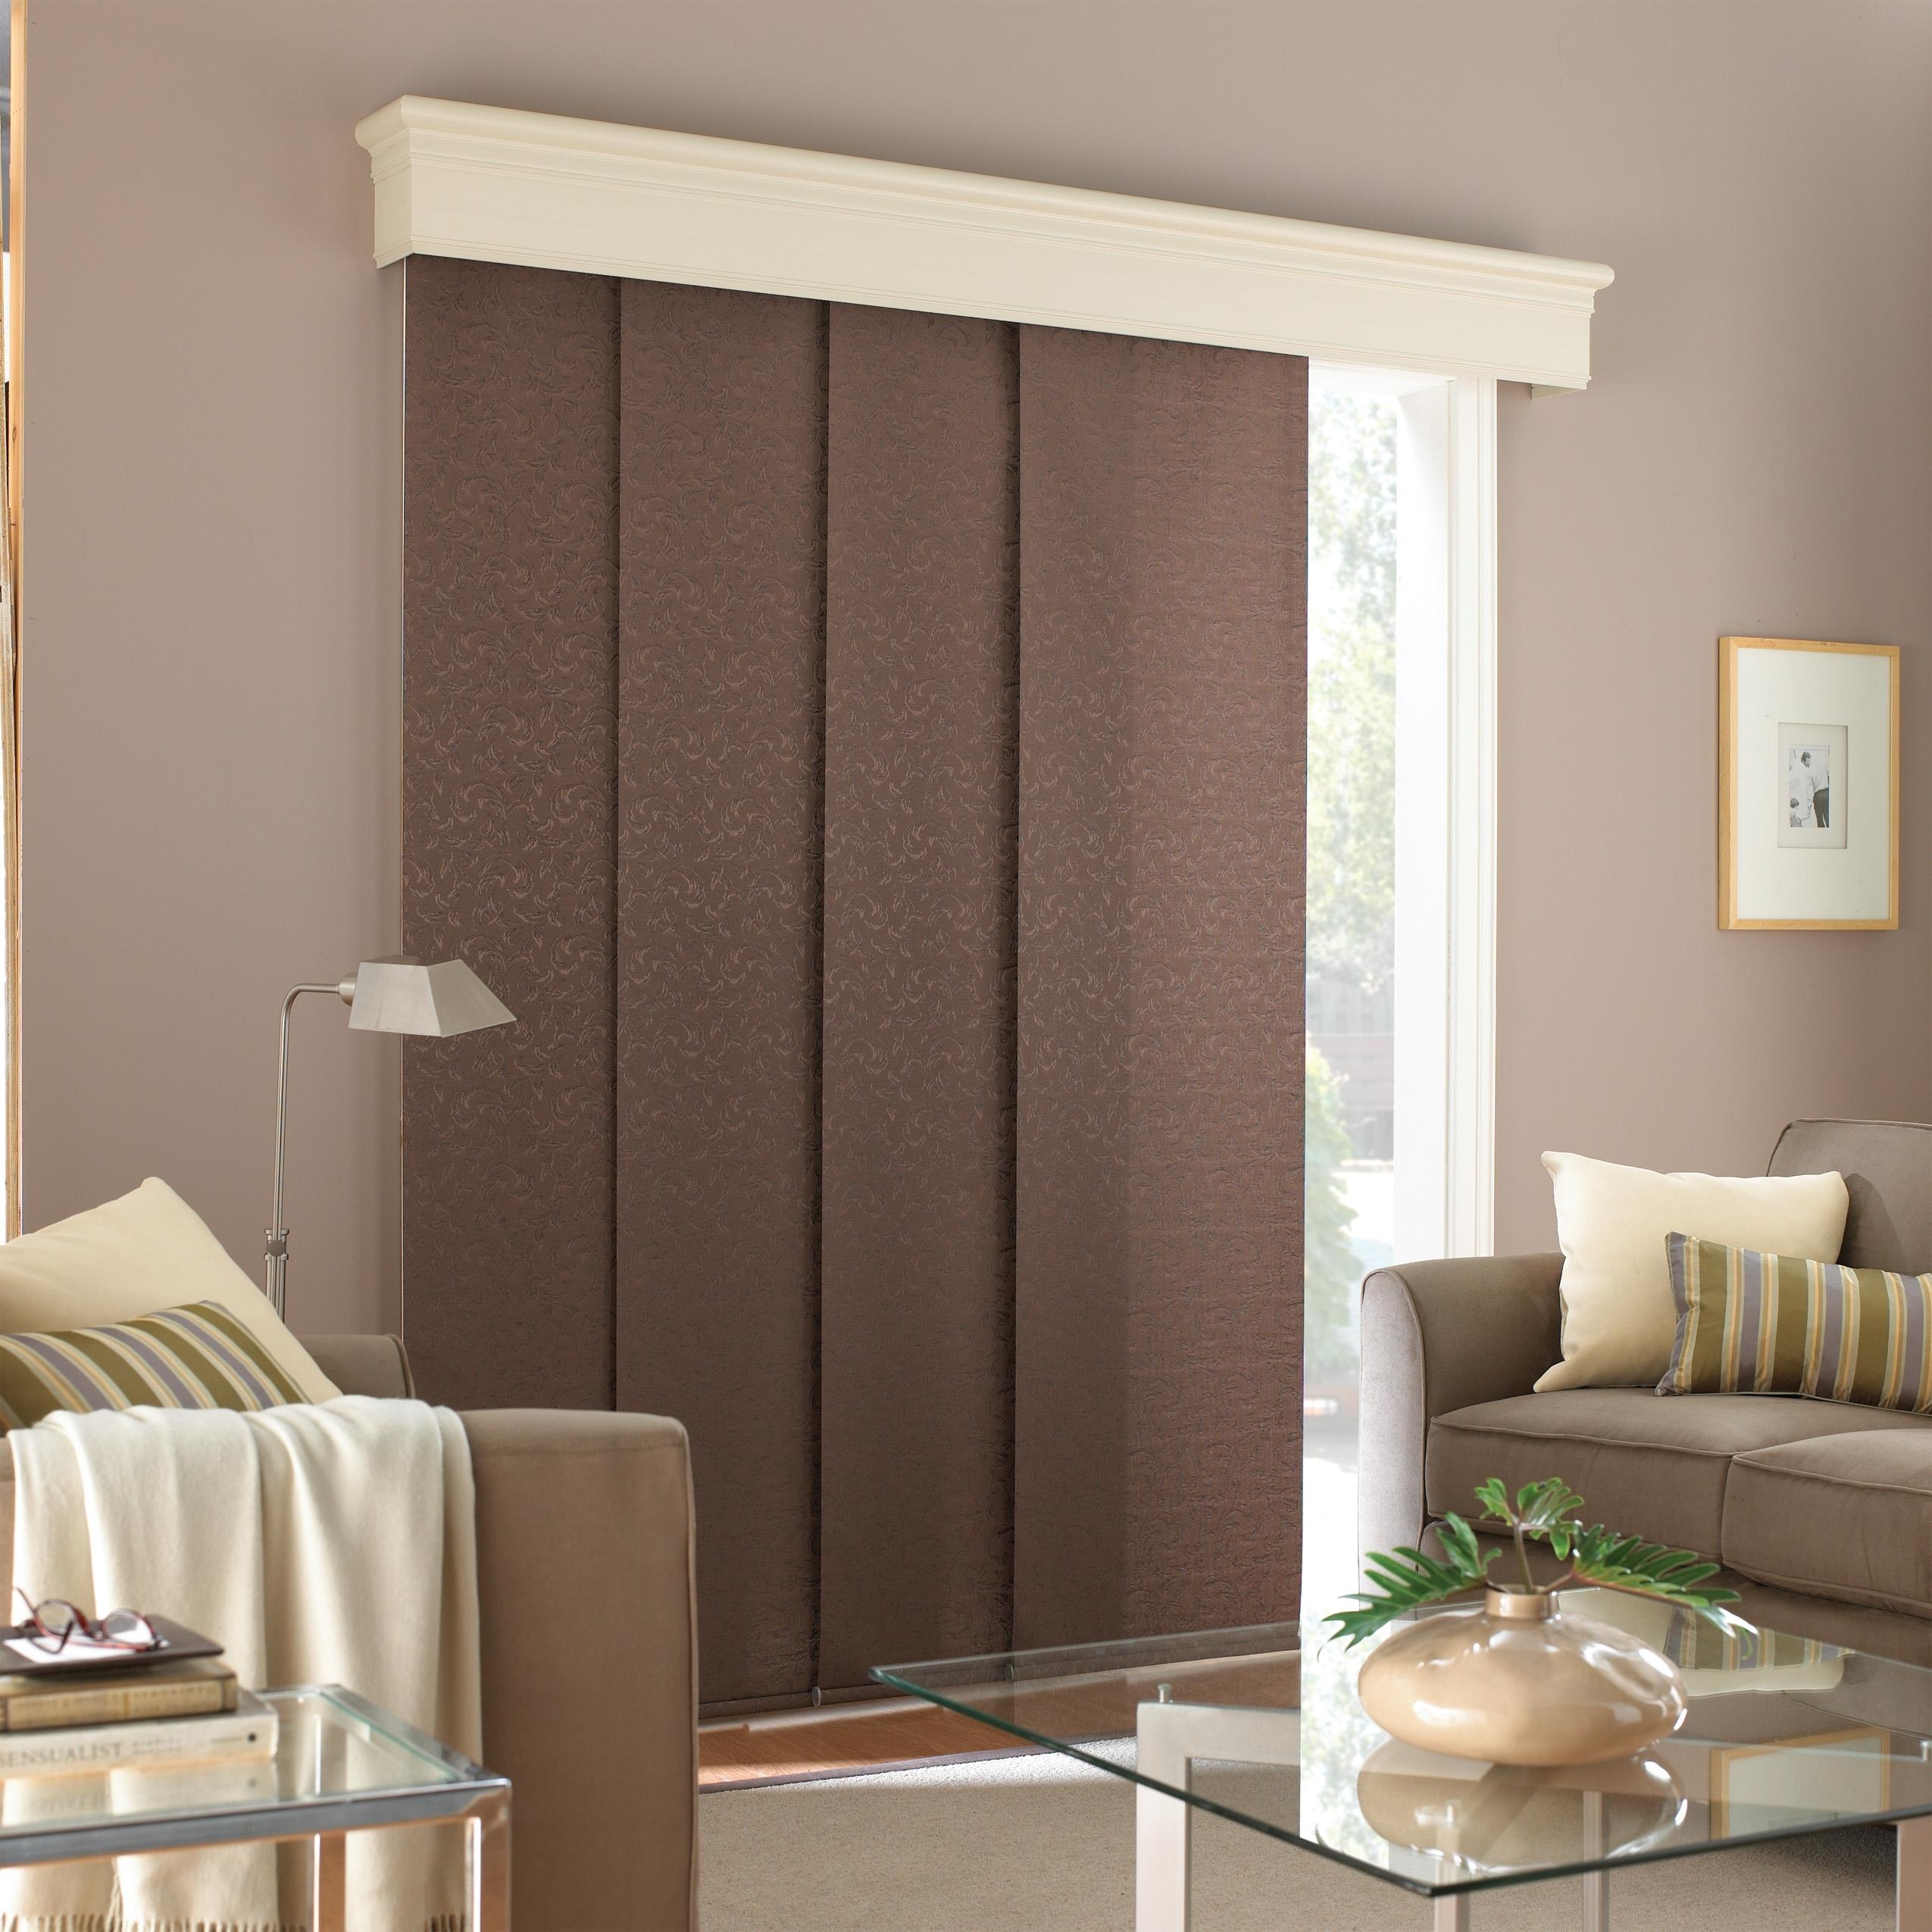 Sliding Panel Blinds For Patio Doors